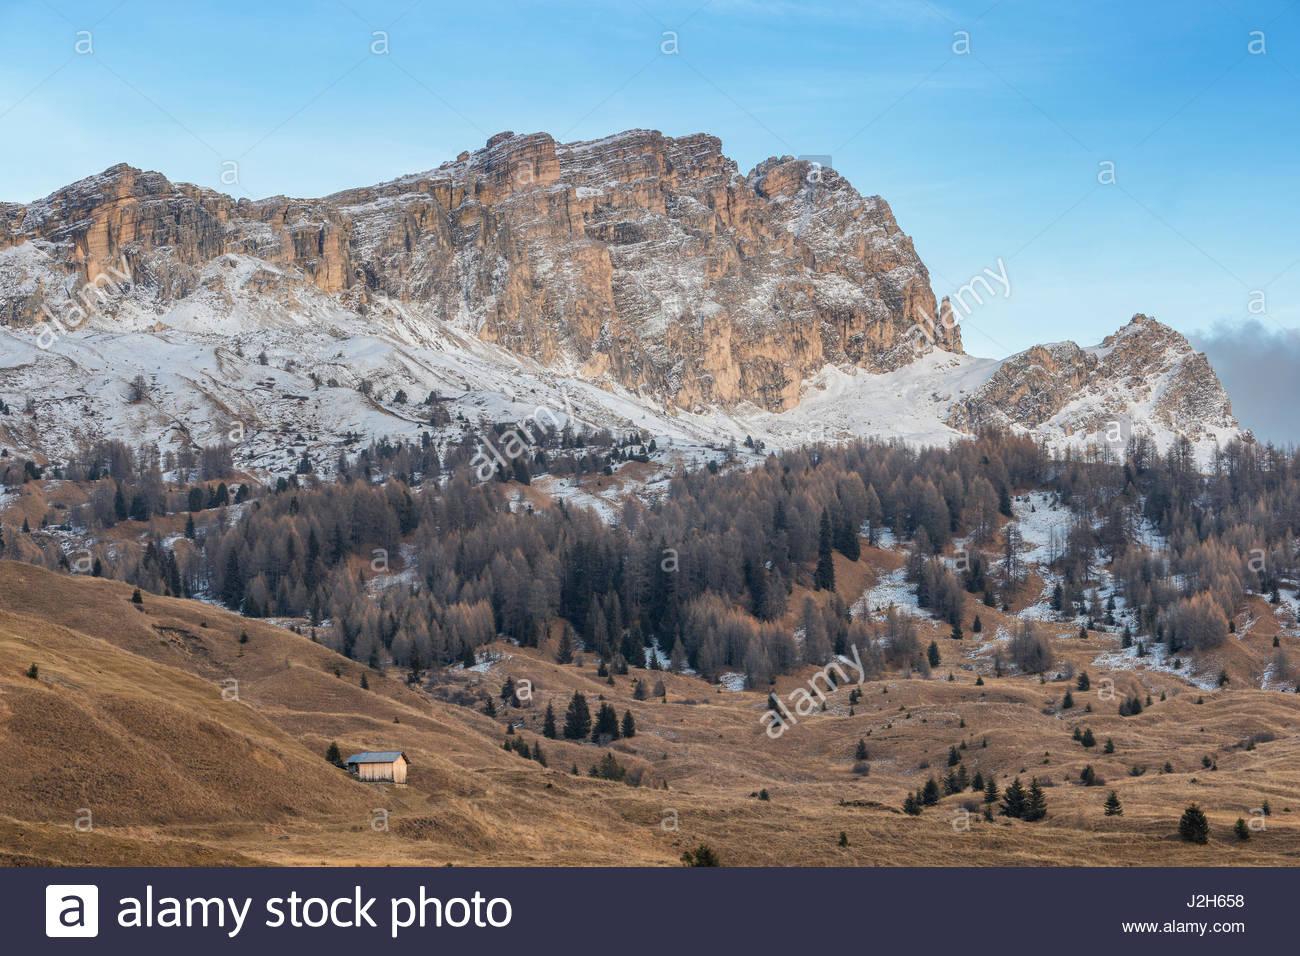 Europe, Italy, Veneto, Belluno. Landscape on the Cherz plateau with Settsass mountain on the background, Dolomites - Stock Image